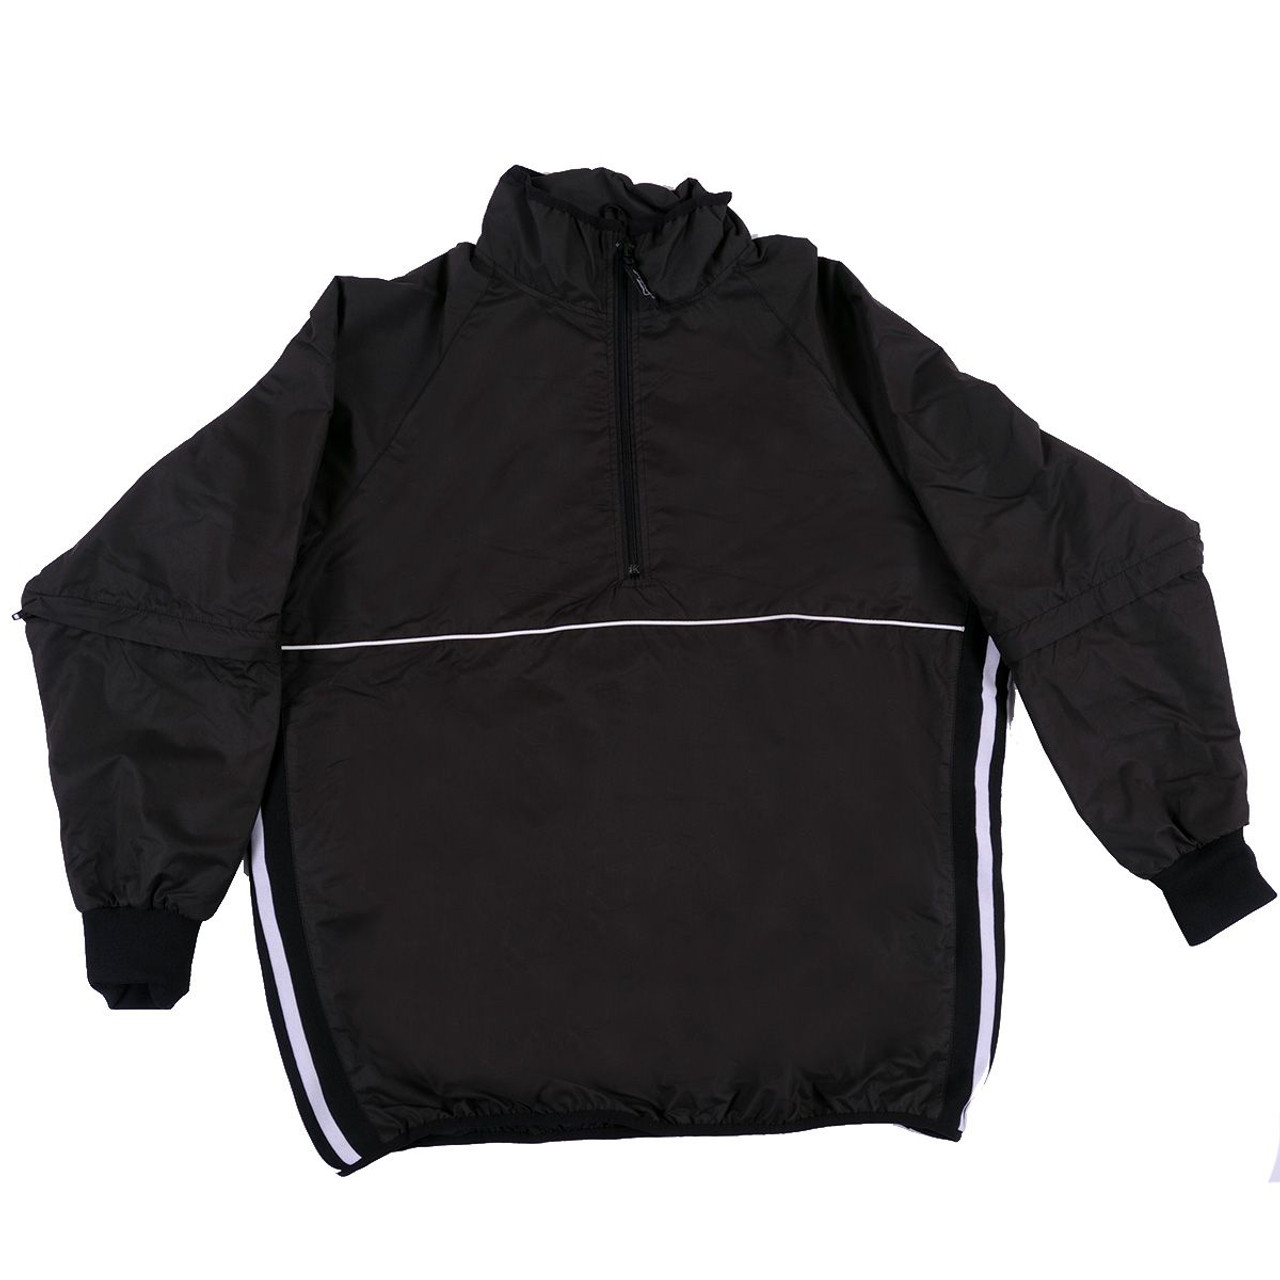 Smitty Pro-Series Convertible Umpire Jacket